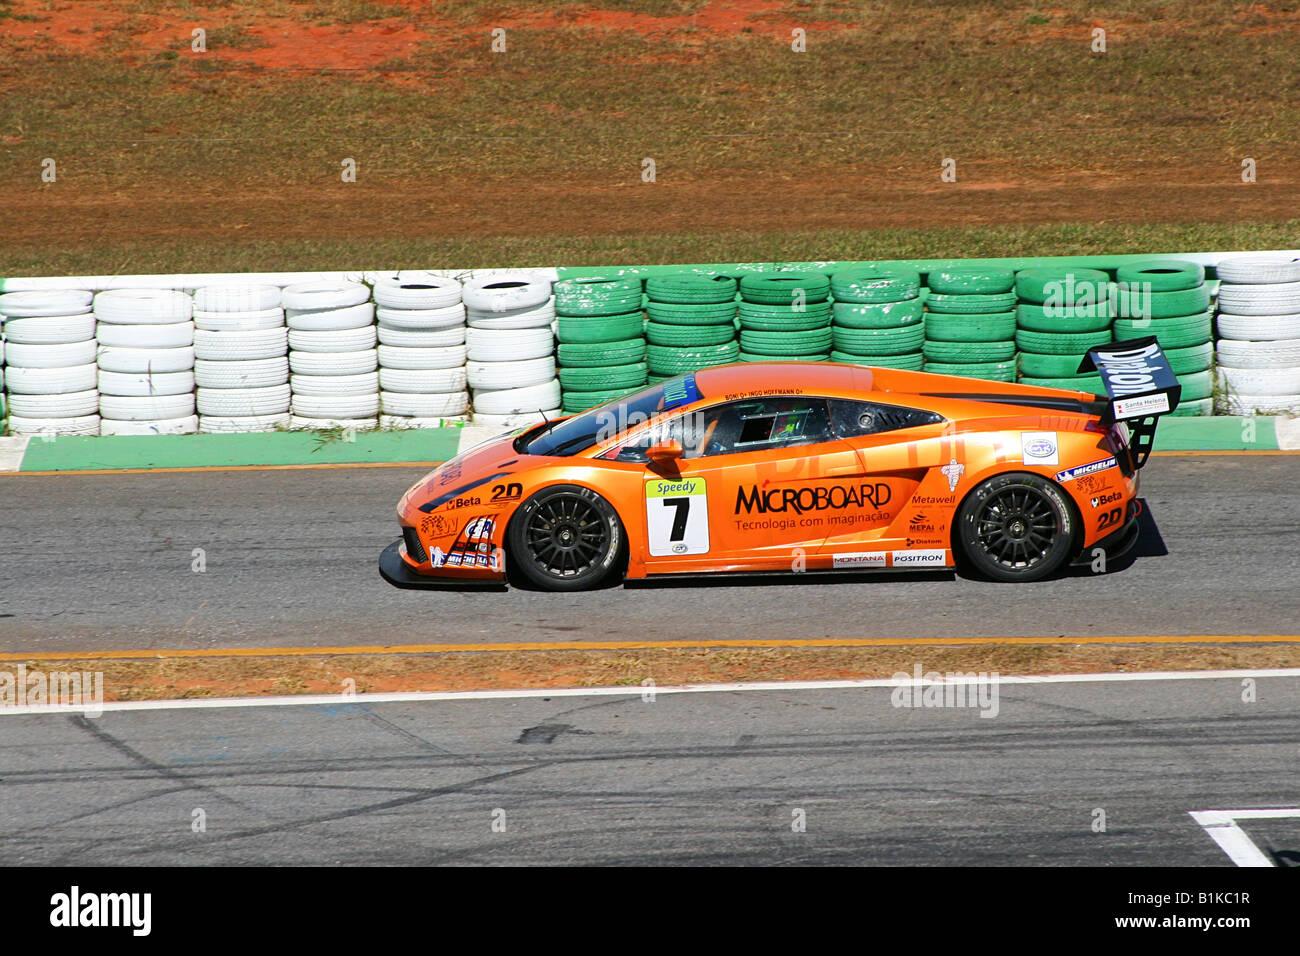 Lamborghini Gallardo, Ingo Hoffmann, GT3 Brazilian Racing Cup, Nelson  Piquet Autodrome, Brasilia